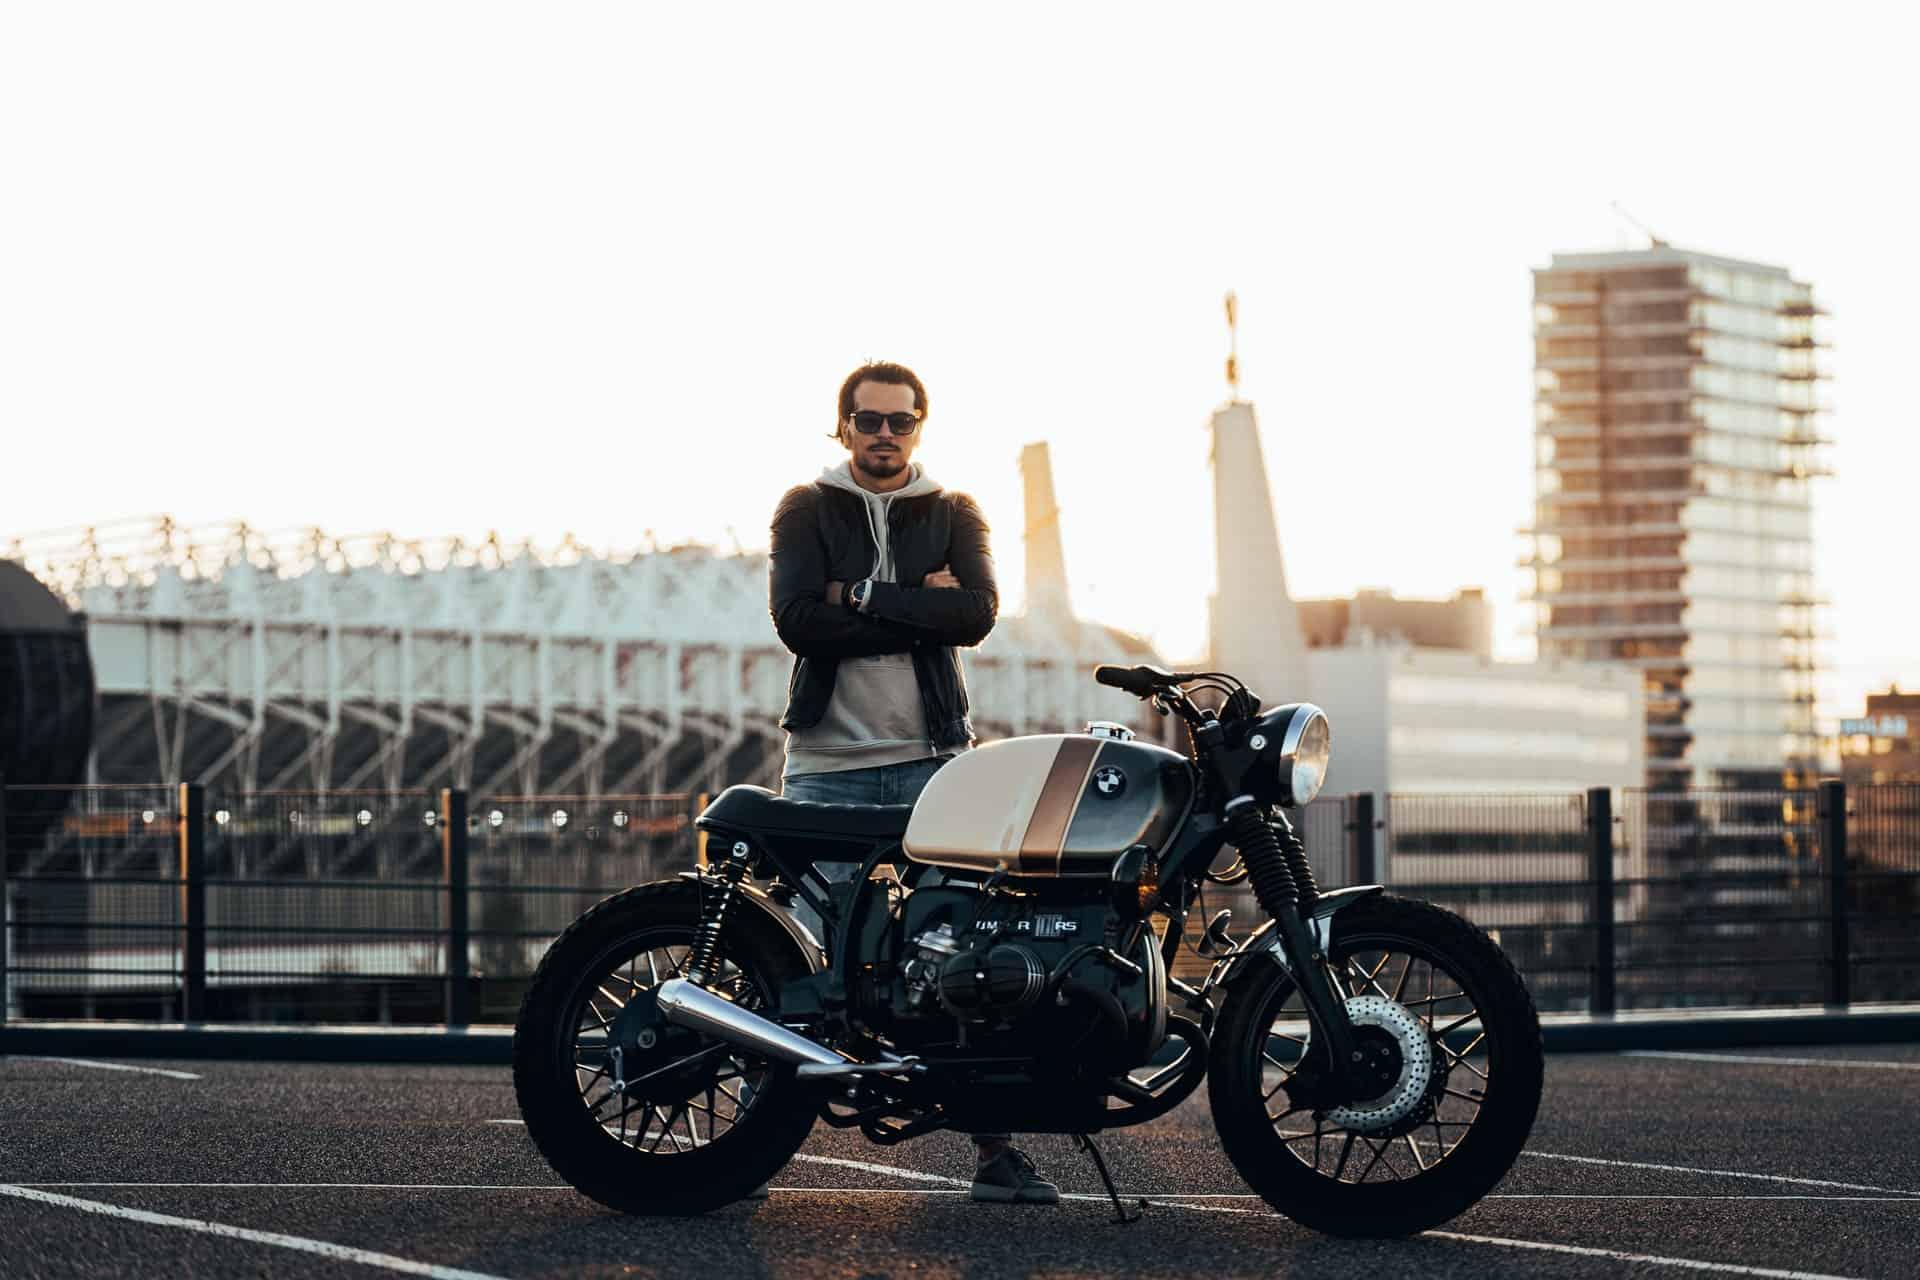 man standing motorcycle